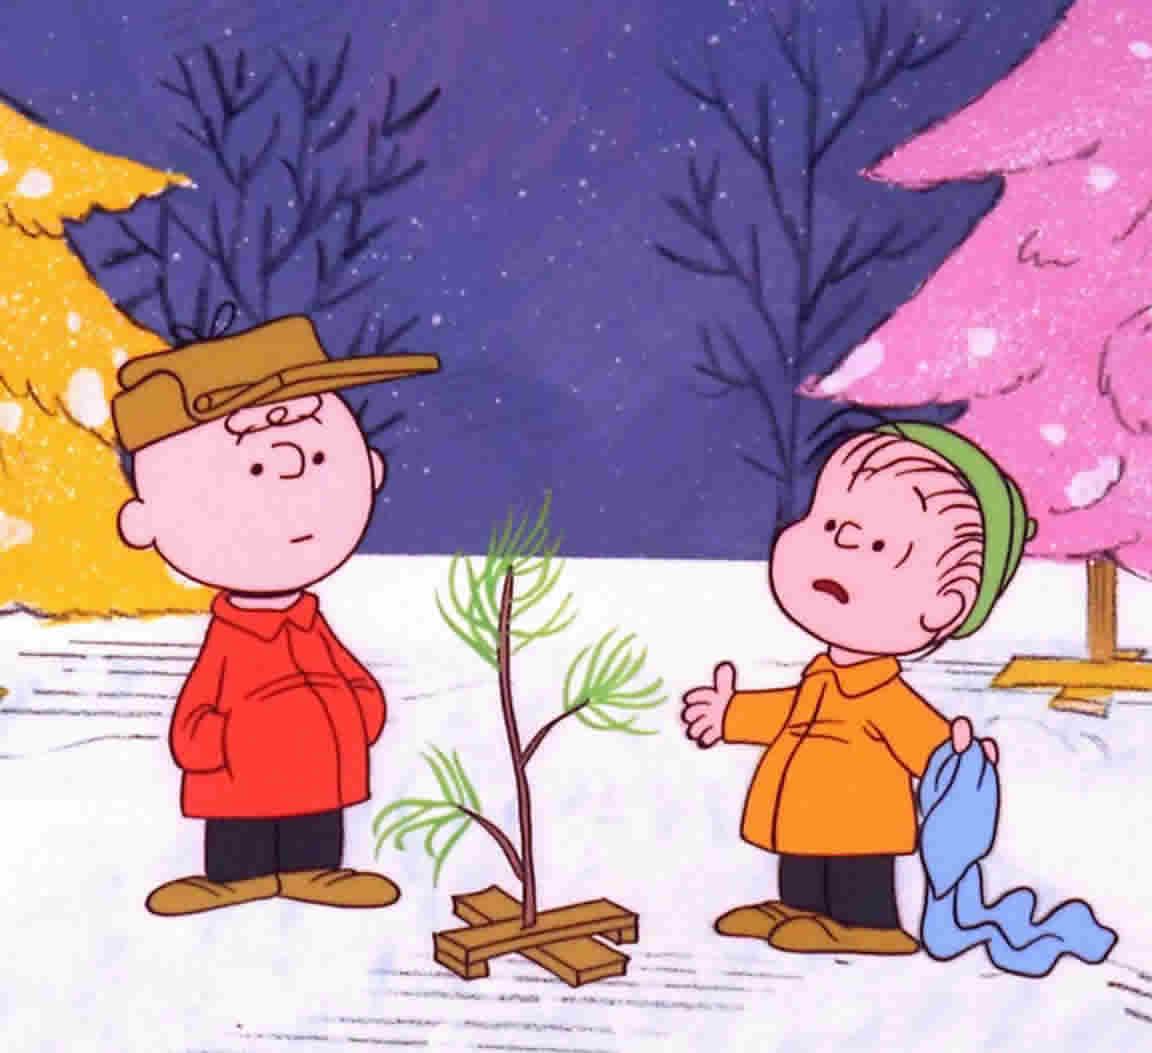 My Mormon Third Eye: I See... A Charlie Brown Christmas